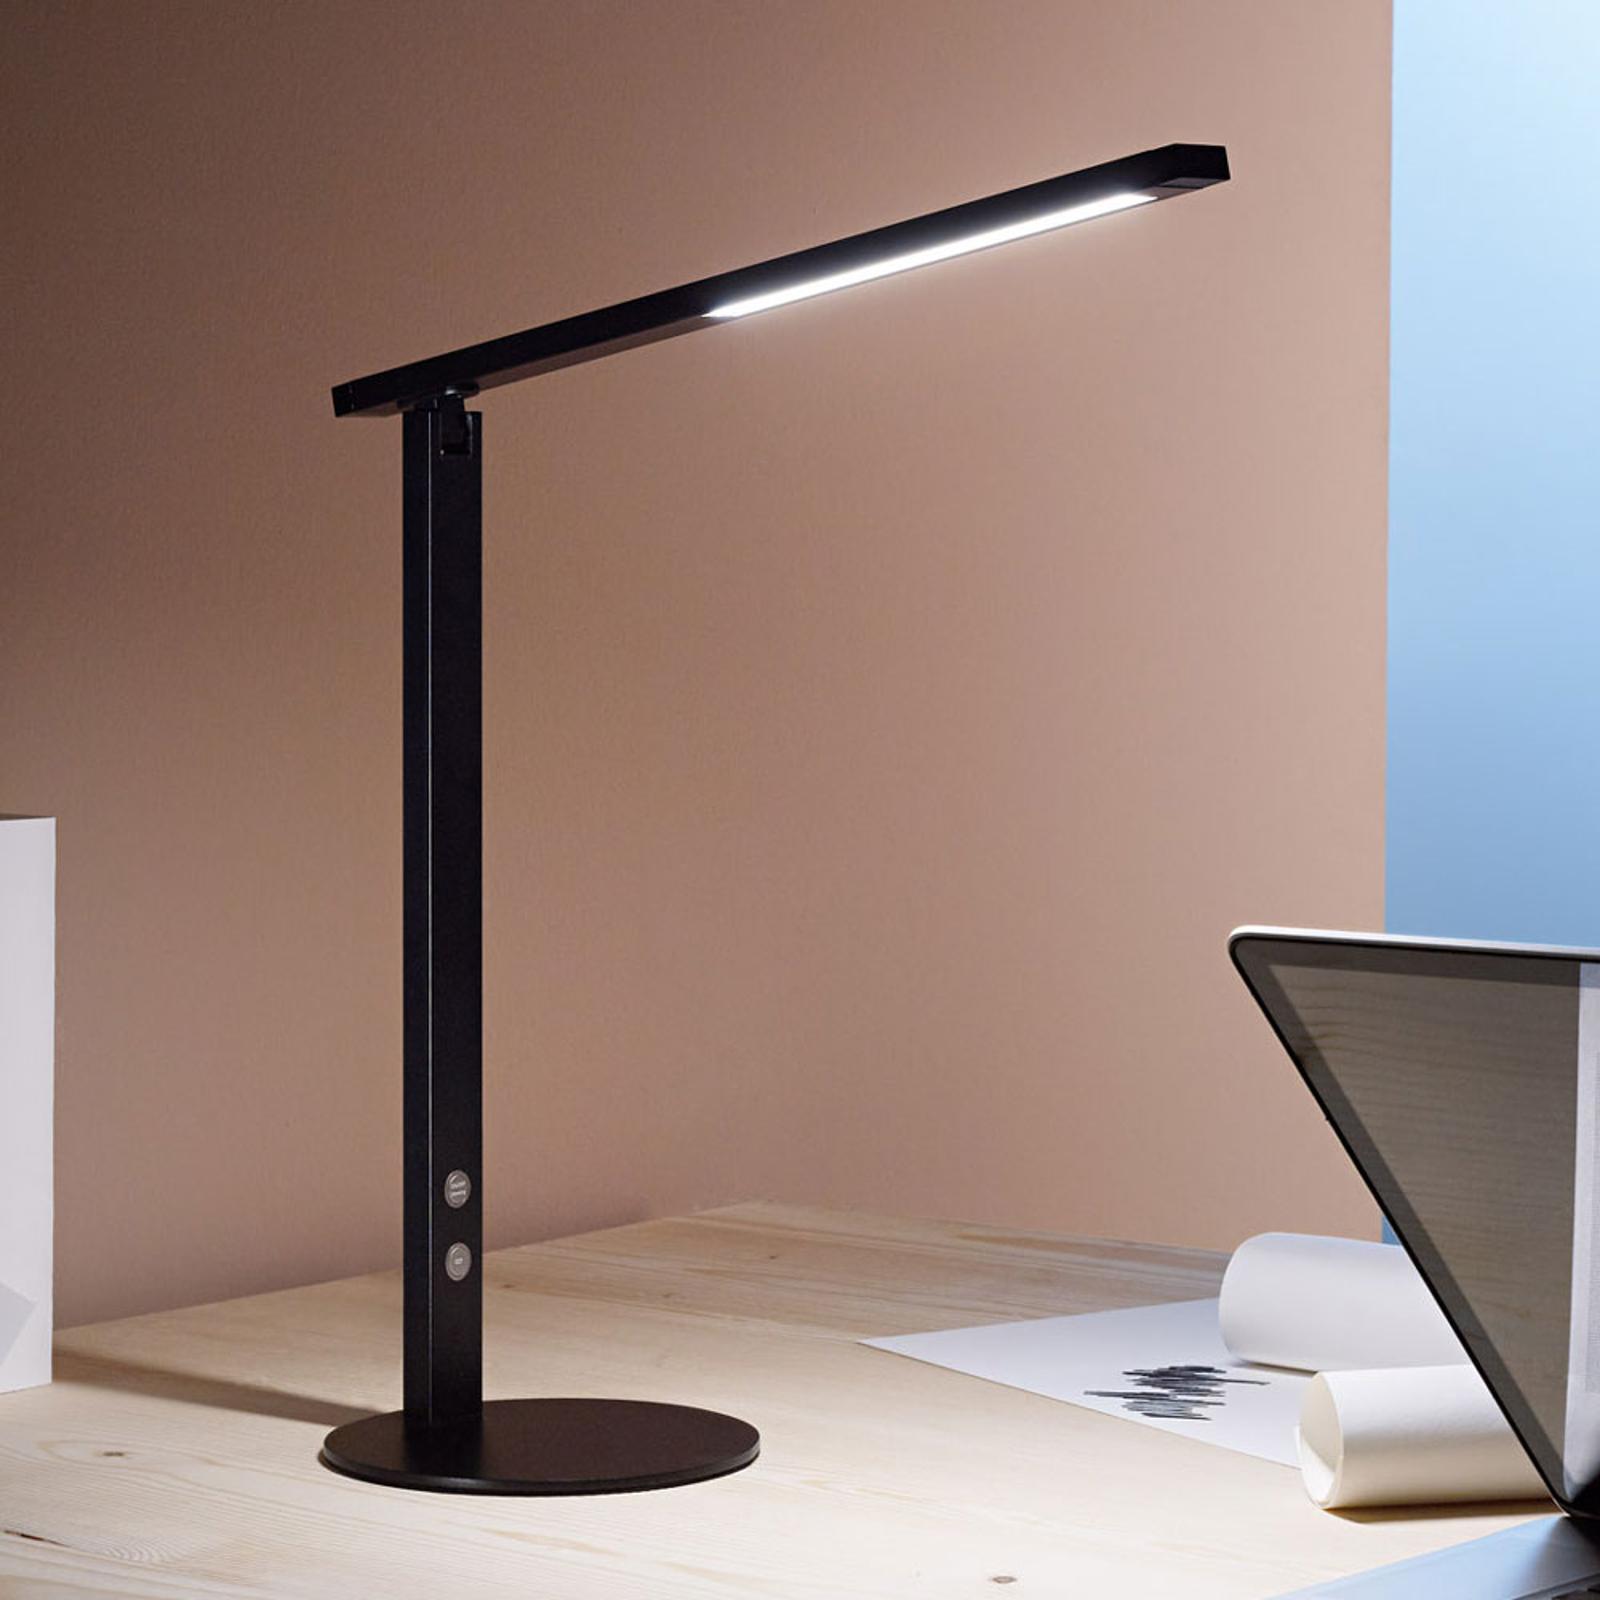 LED bureaulamp Ideal met dimmer, zwart